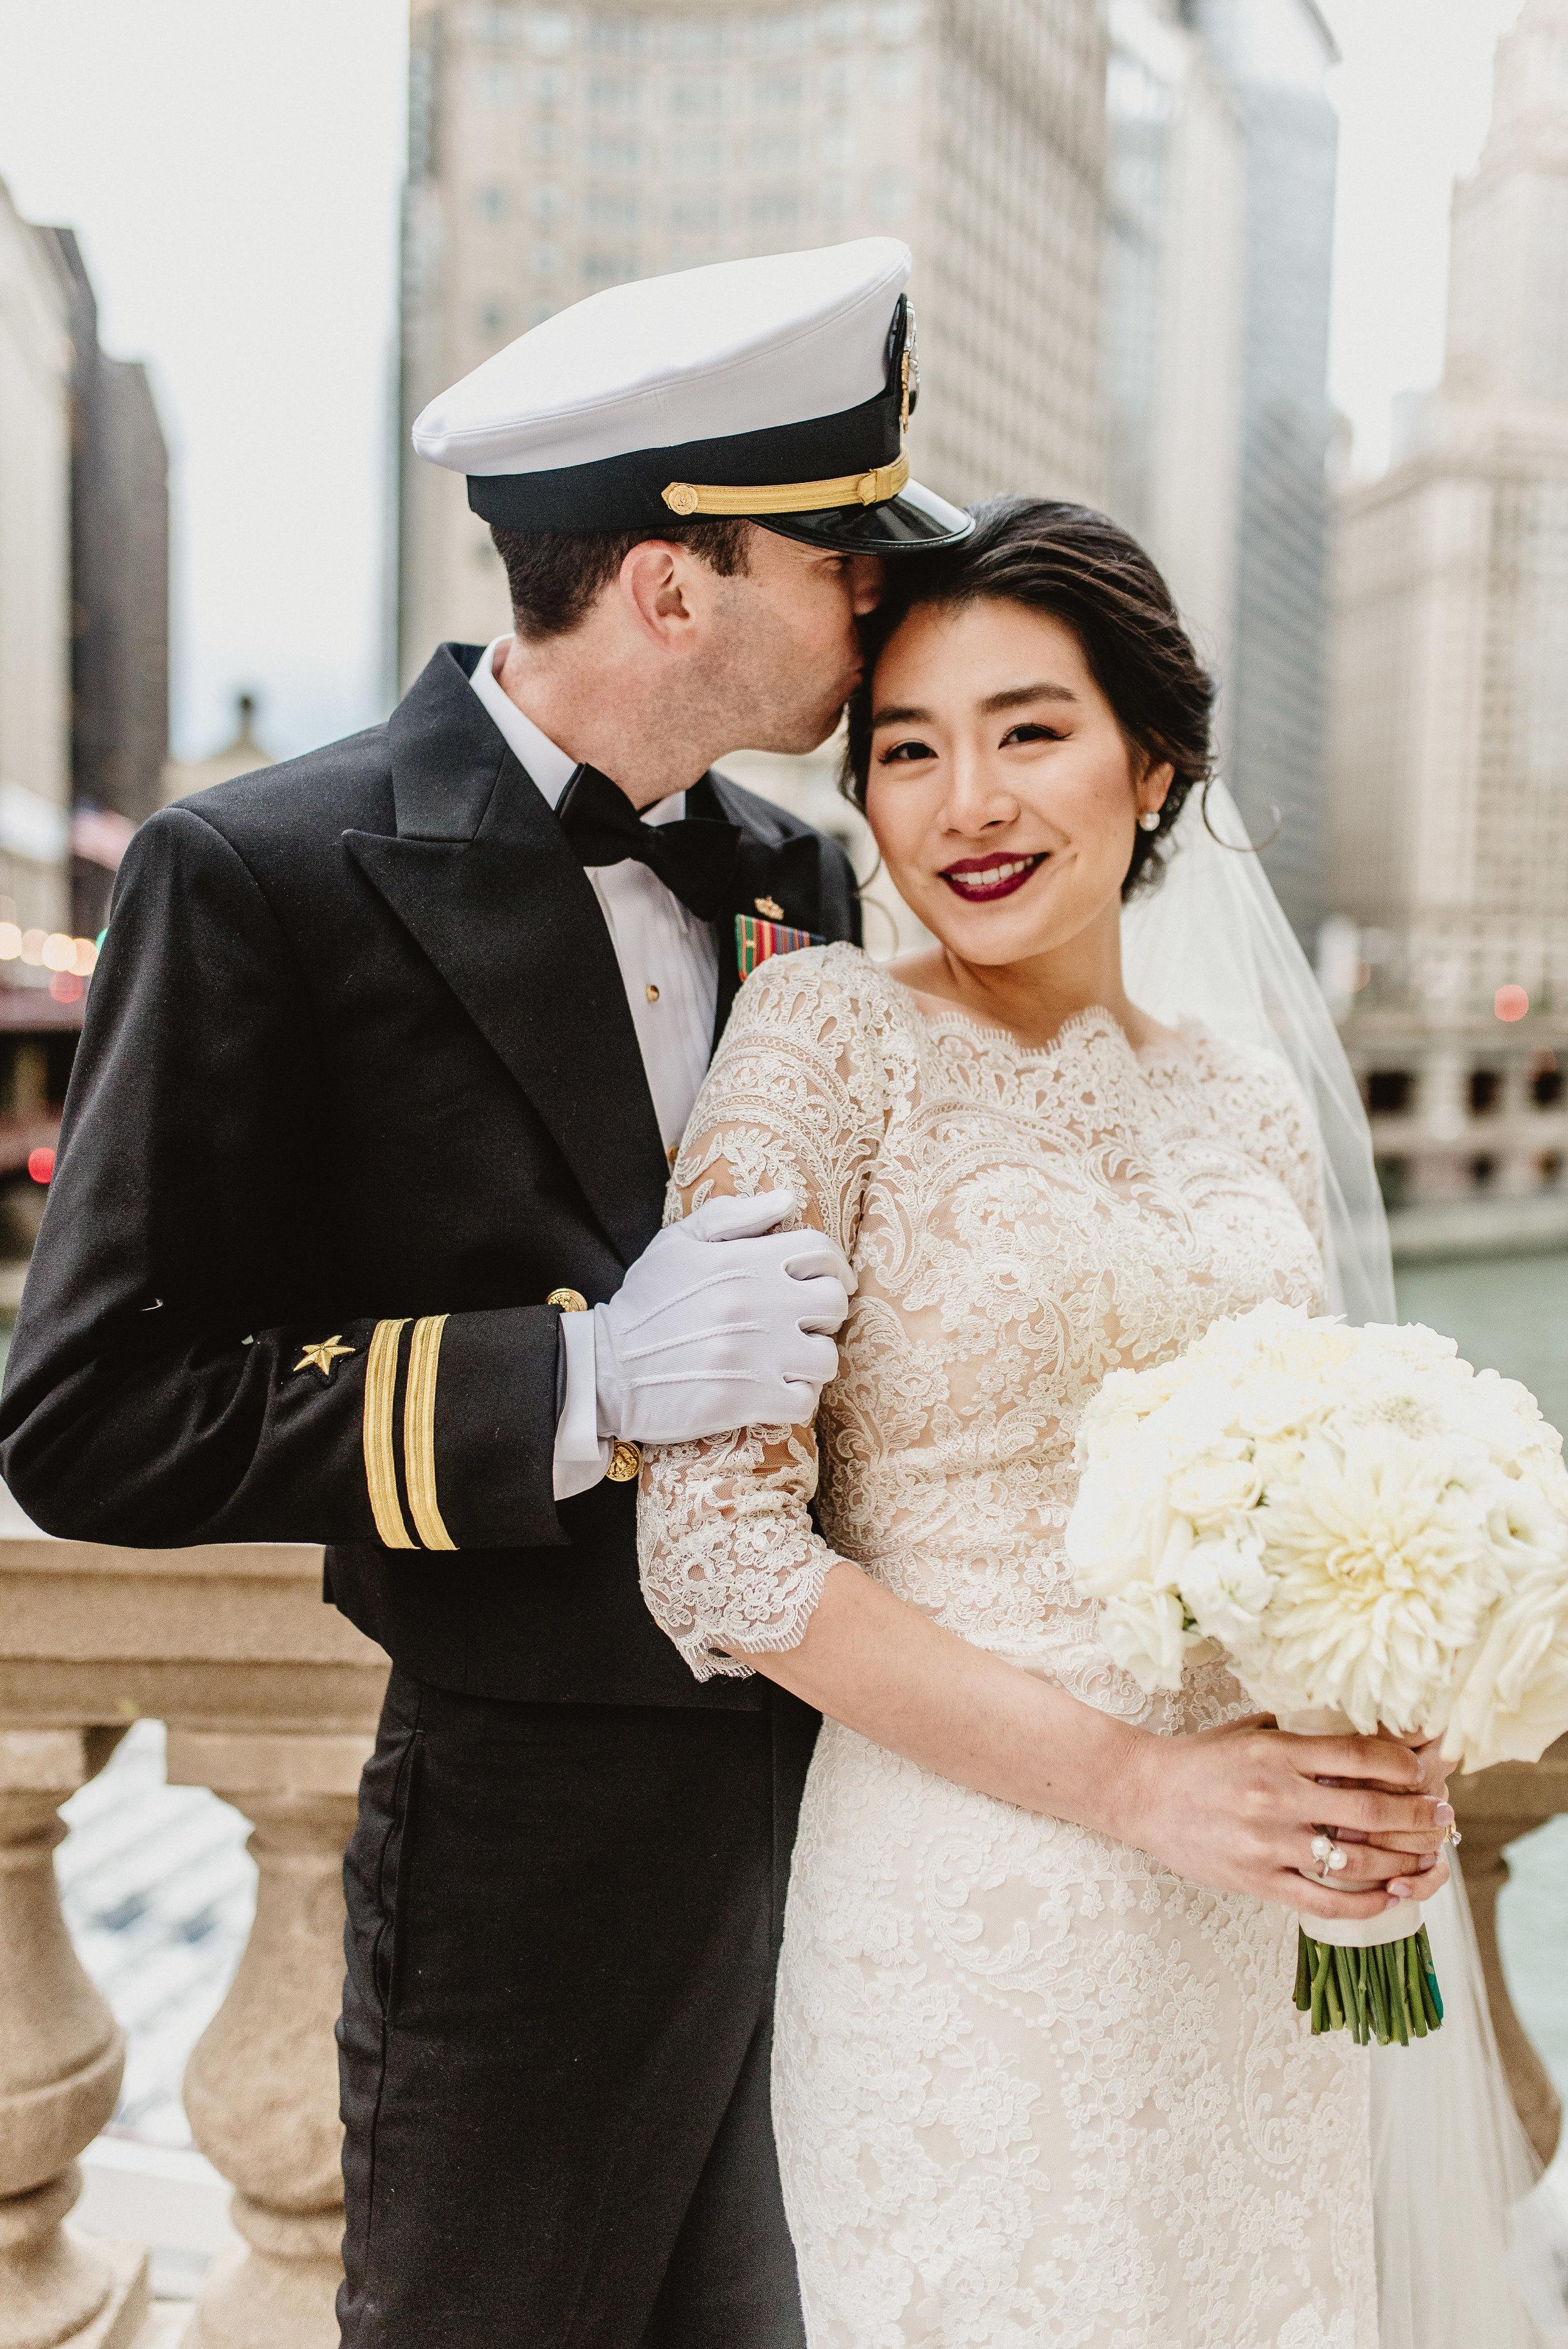 Melissa + Andrew Wedding - Marriott Magnificent Mile, Chicago, IL